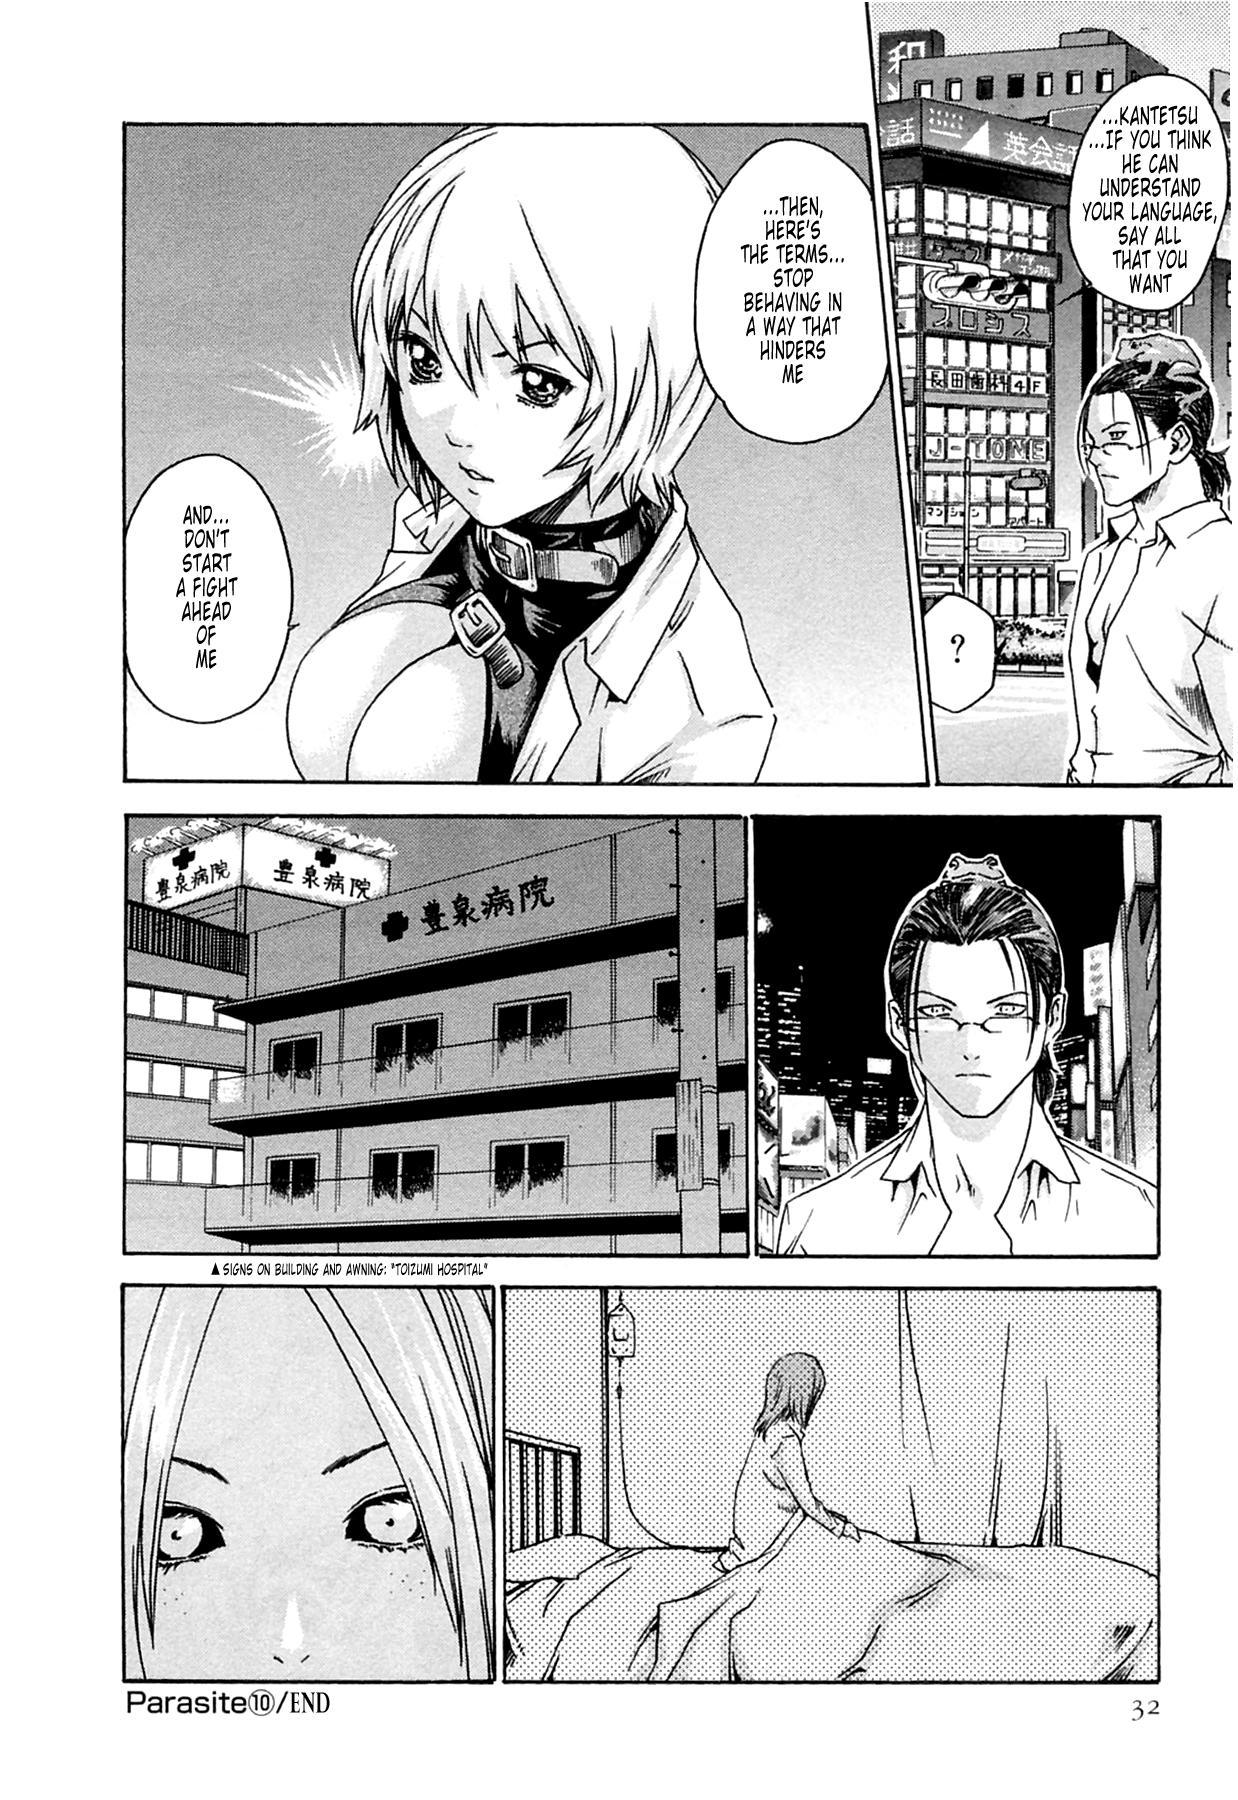 [Haruki] Kisei Juui Suzune (Parasite Doctor Suzune) Vol.02 - CH10-11 31